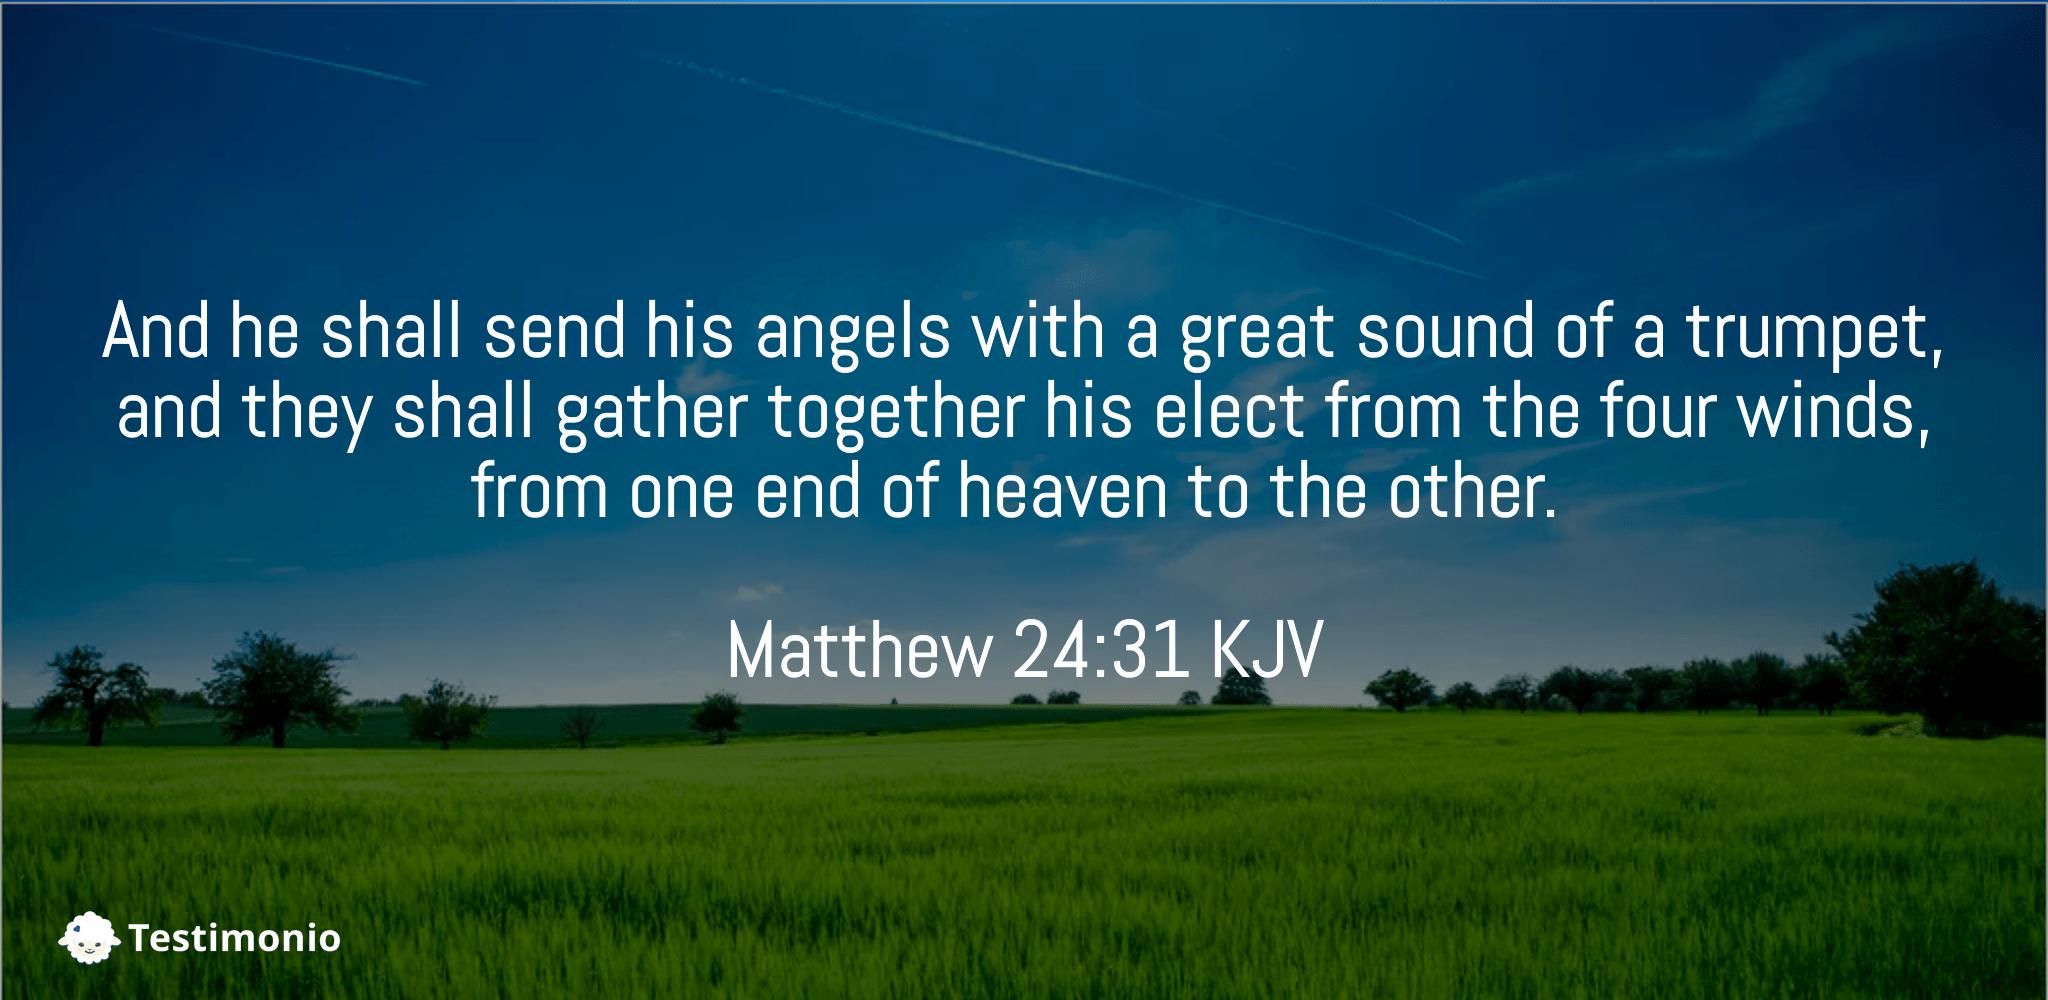 Matthew 24:31